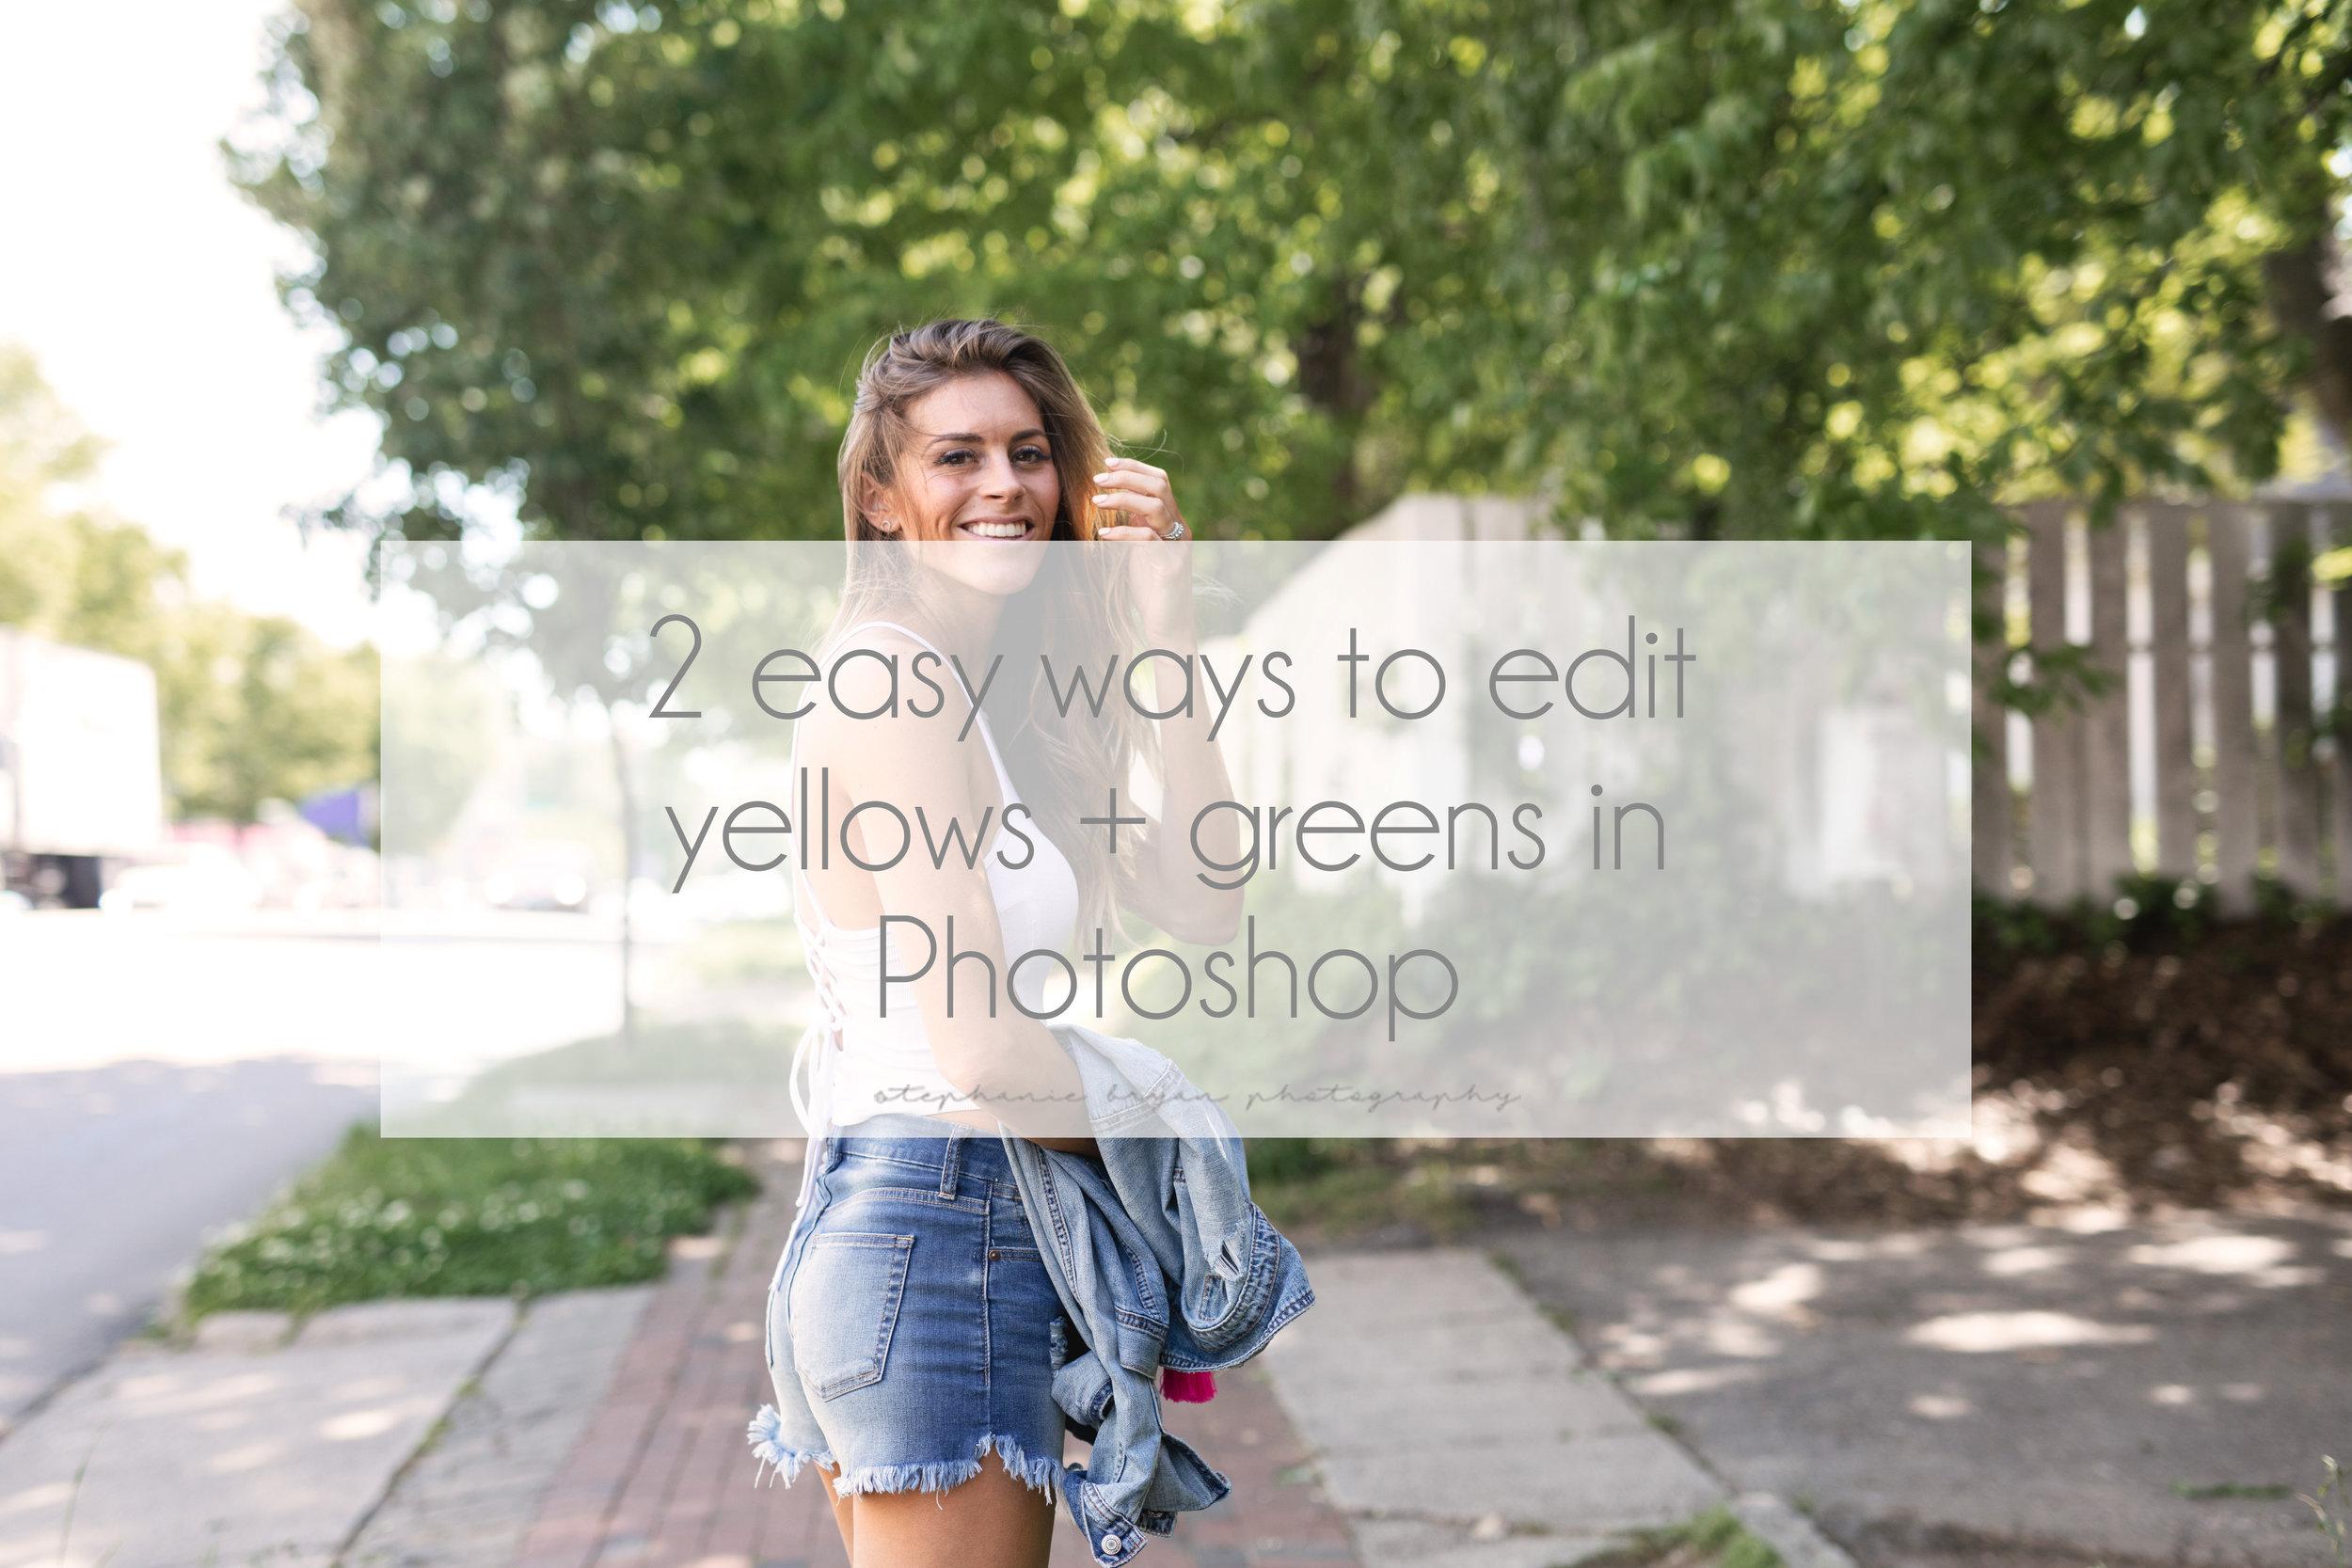 sbp_yellows_greensPS.jpg